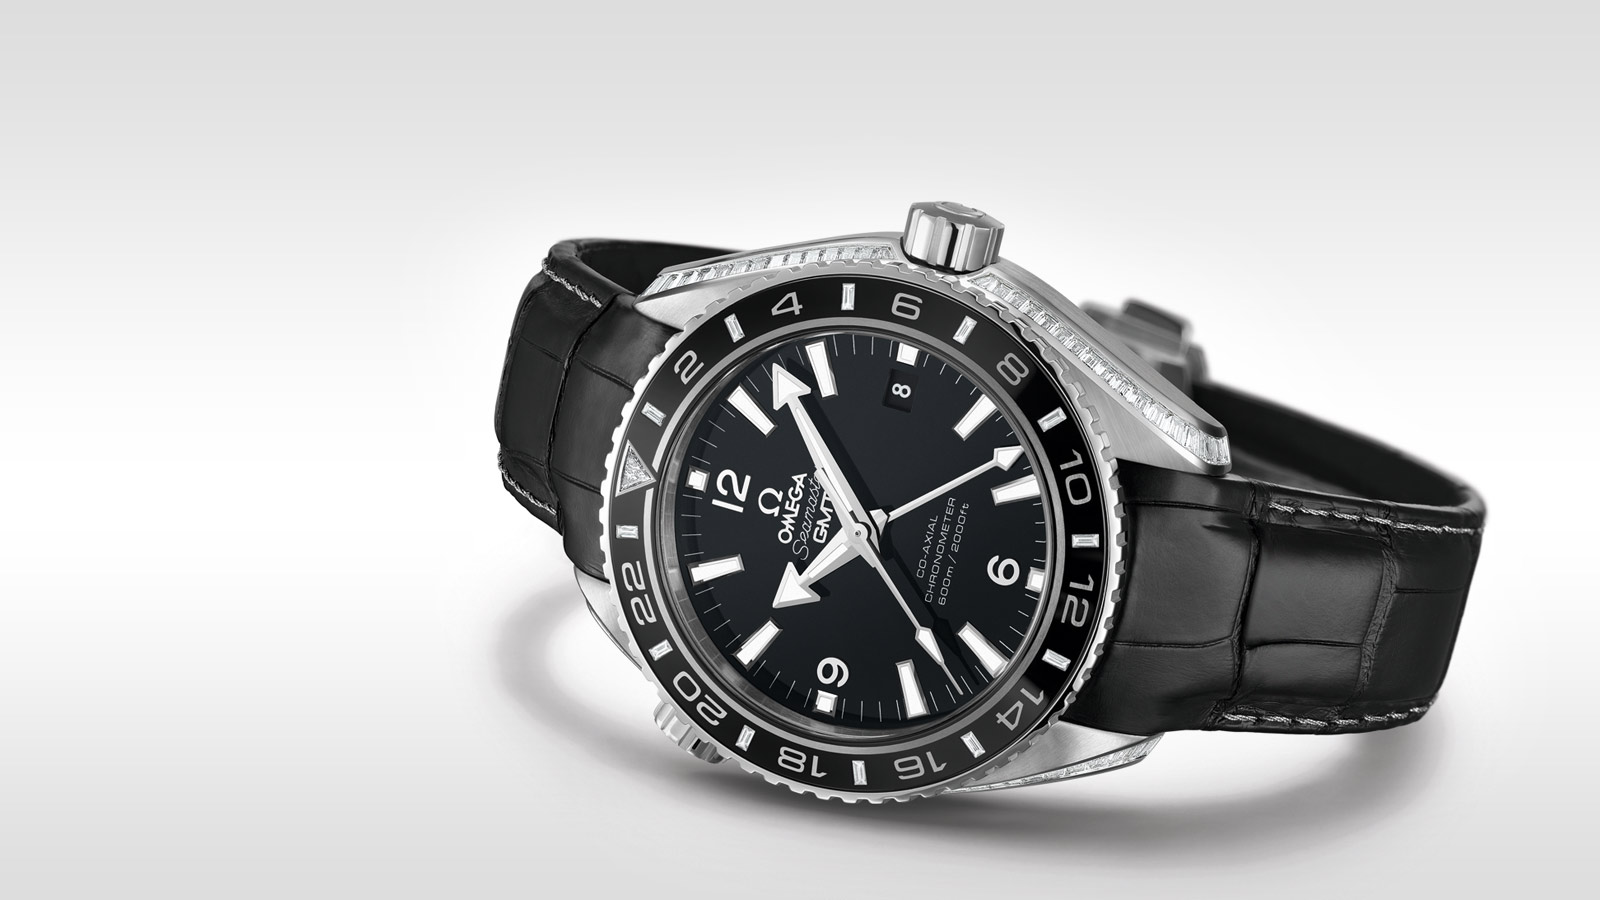 Seamaster 海洋宇宙600米腕表 海洋宇宙600米 欧米茄43.5毫米同轴GMT腕表 - 232.98.44.22.01.001 - 查看 1